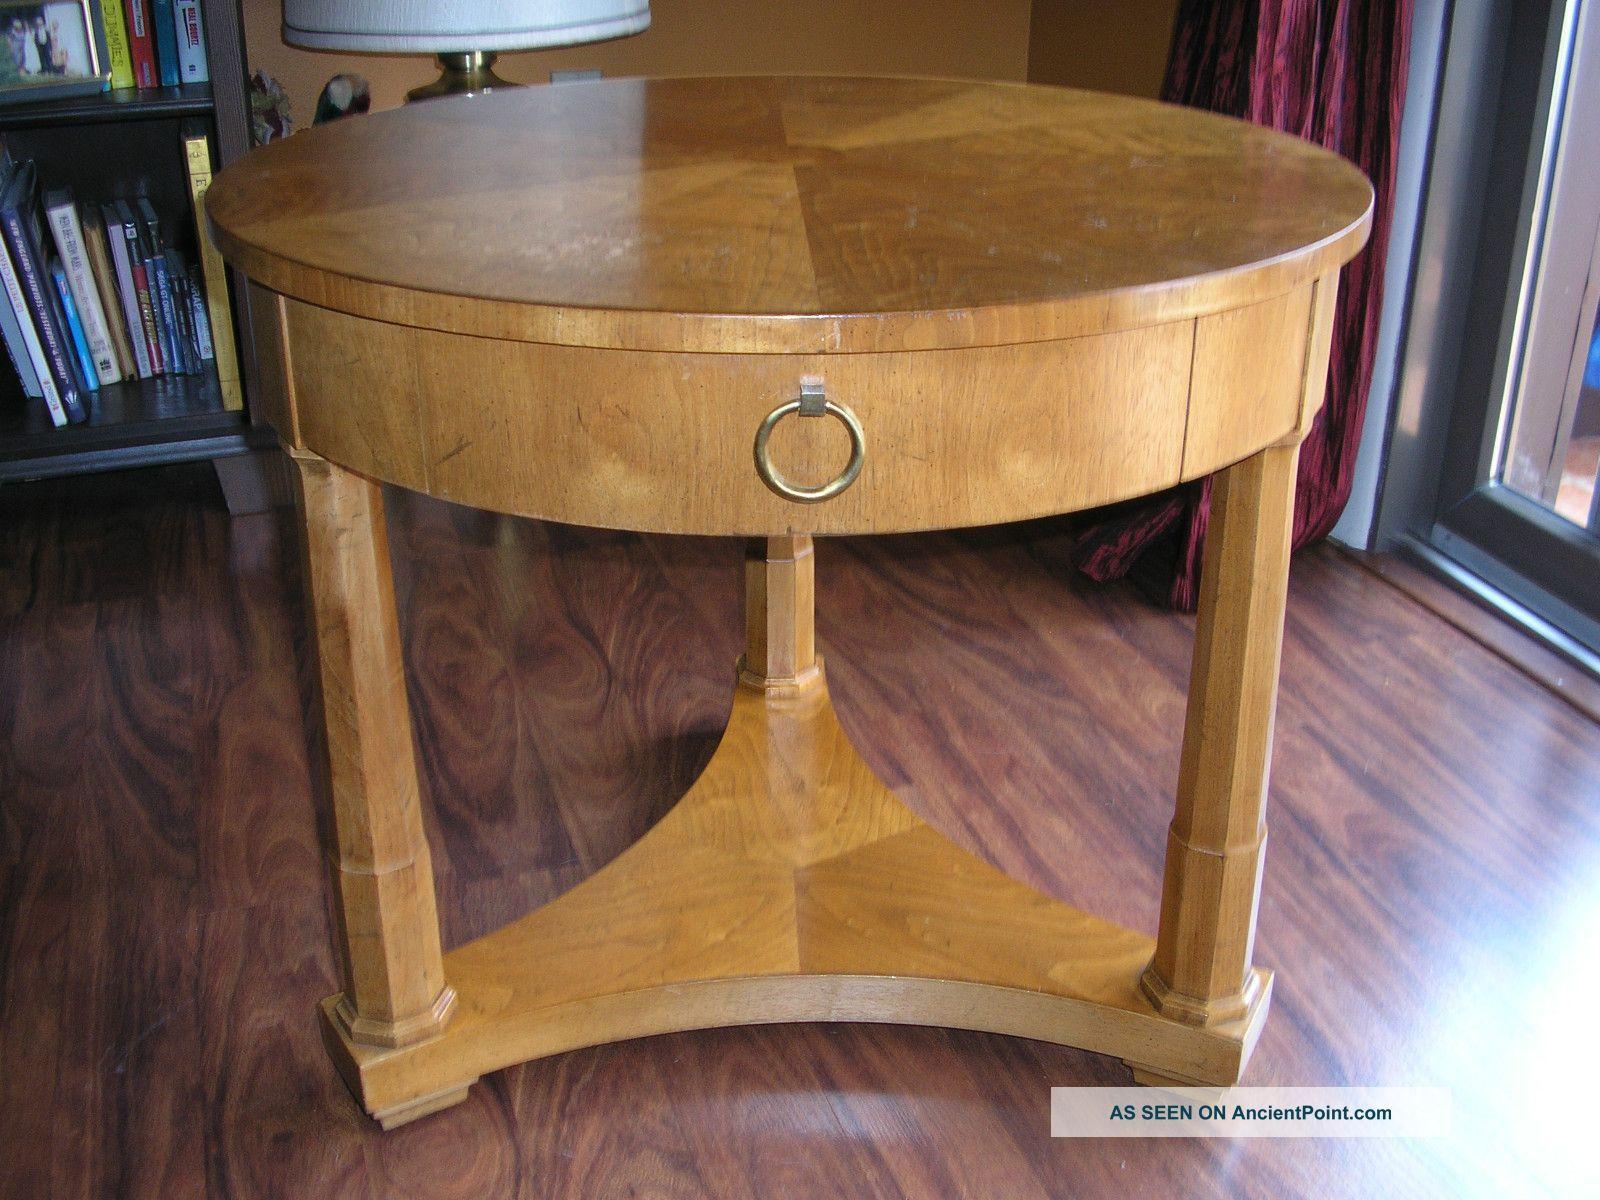 Vintage Milling Road Division Of Baker Furniture Round Side Table Single Drawer Round Side Table Side Table Baker Furniture [ 1200 x 1600 Pixel ]